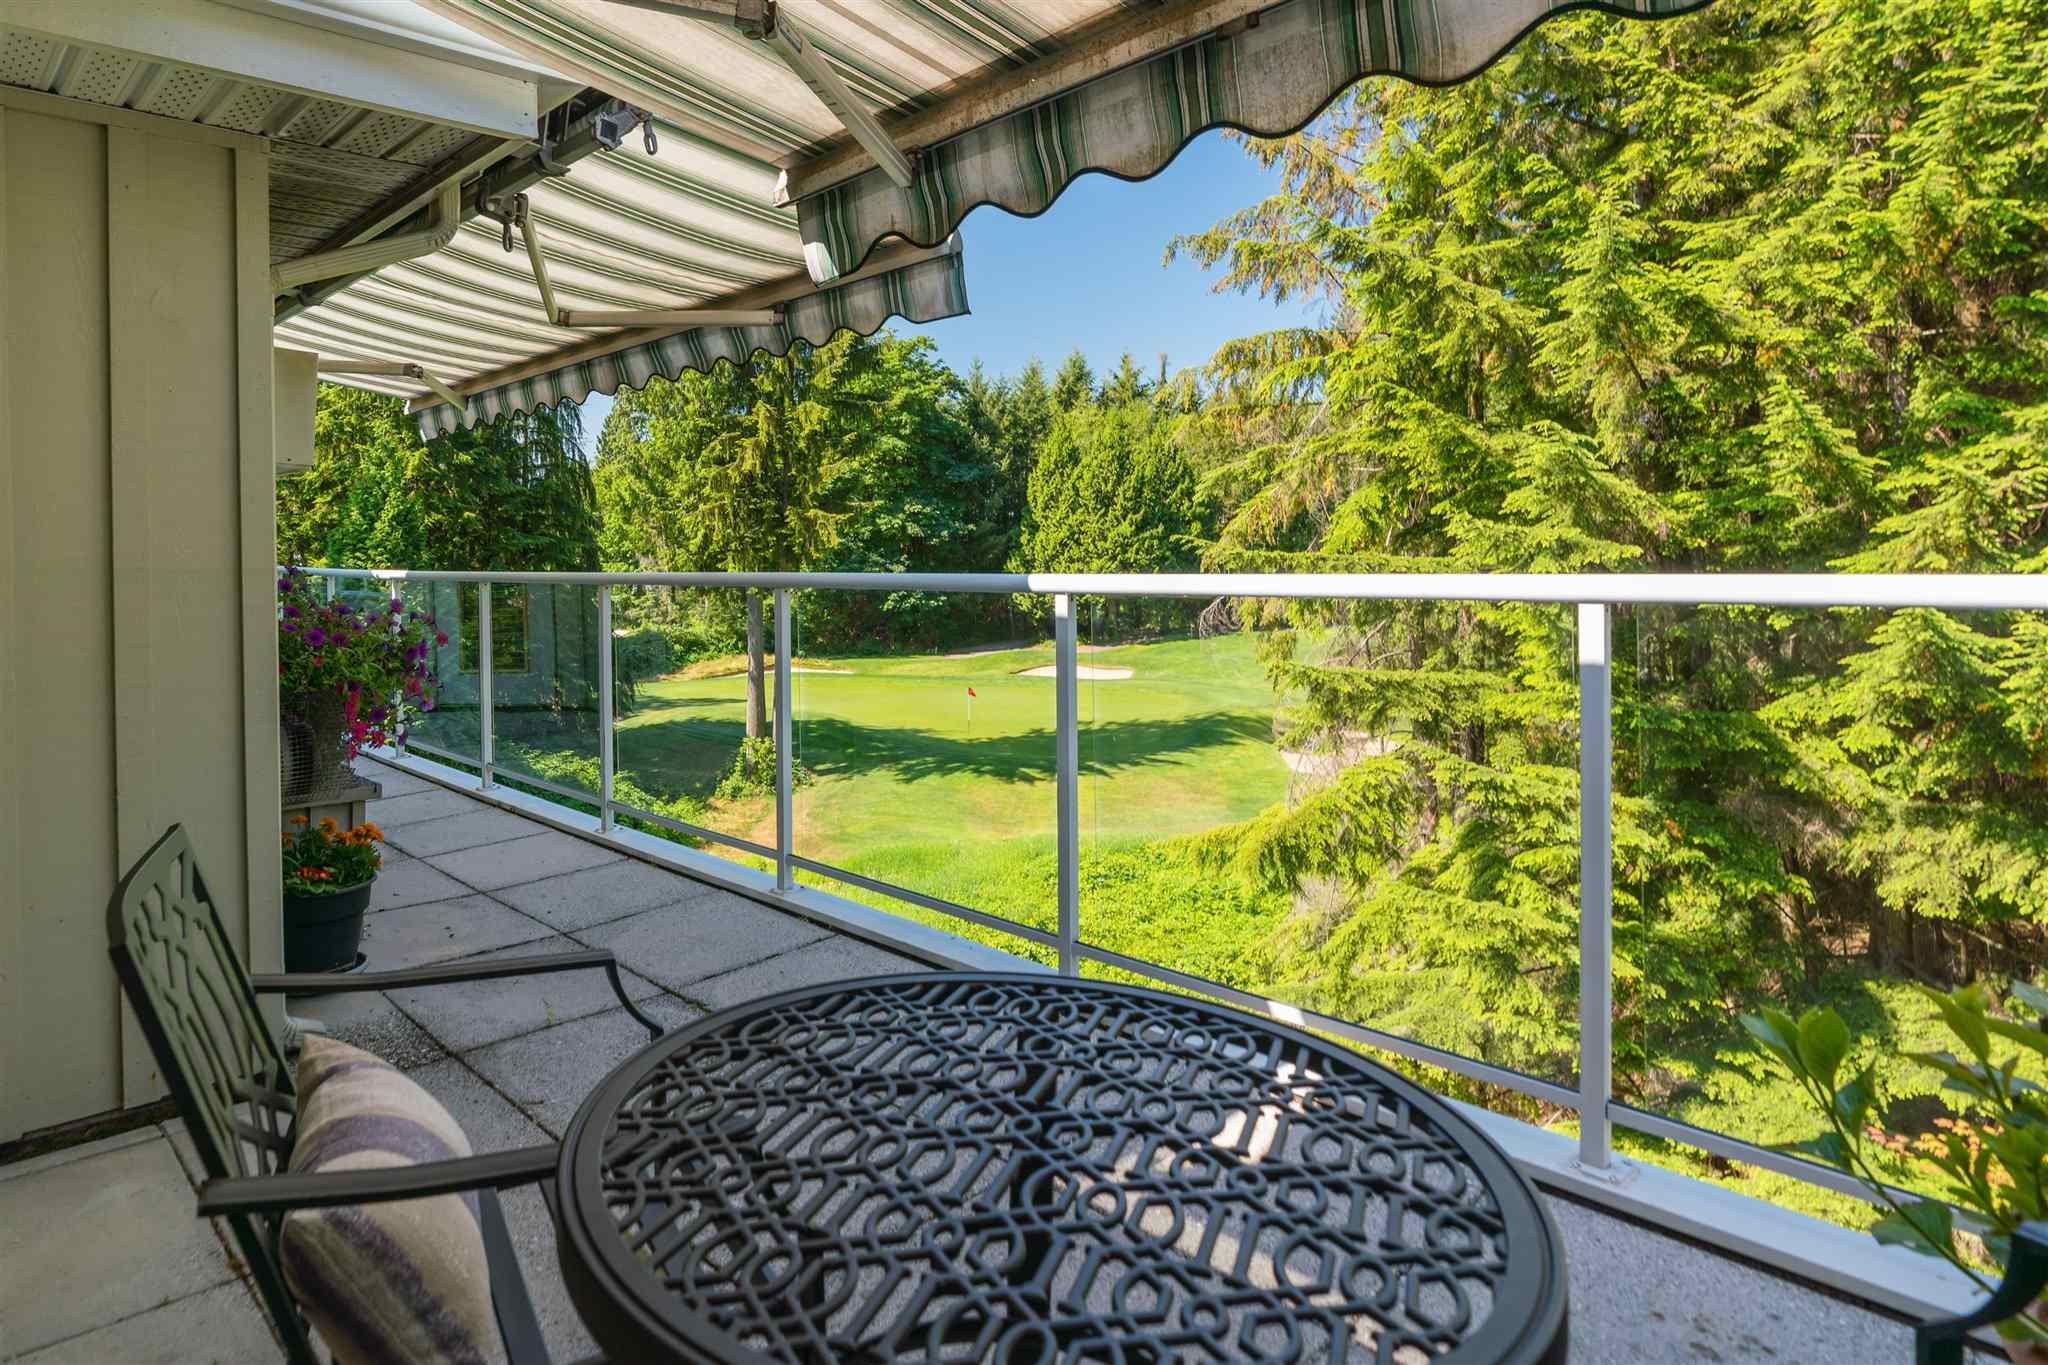 402 1281 PARKGATE AVENUE - Northlands Apartment/Condo for sale, 2 Bedrooms (R2606726) - #1